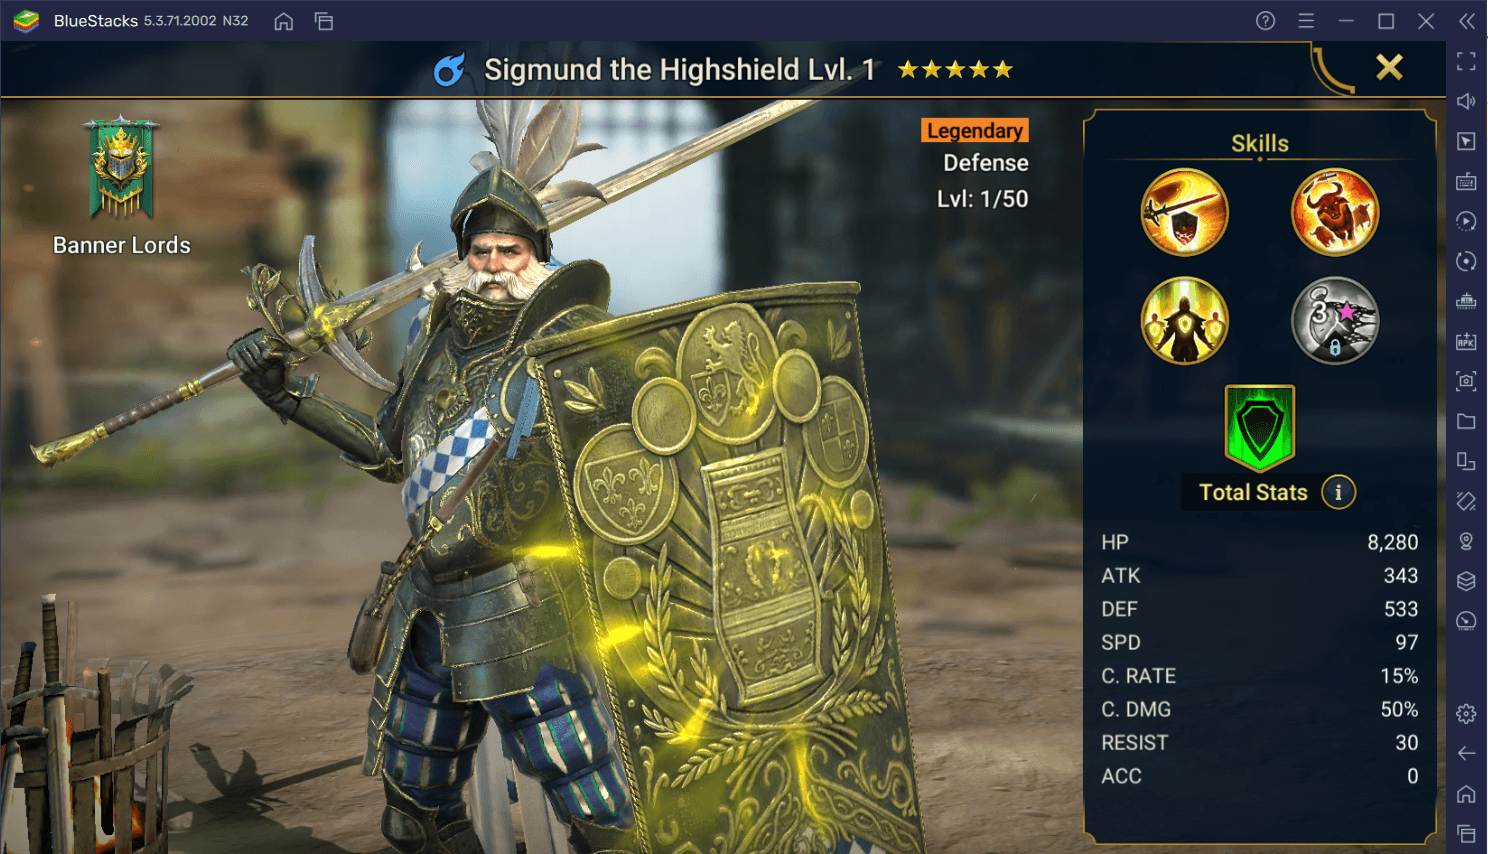 RAID: Shadow Legends – Sigmund the Highshield Fusion Guide